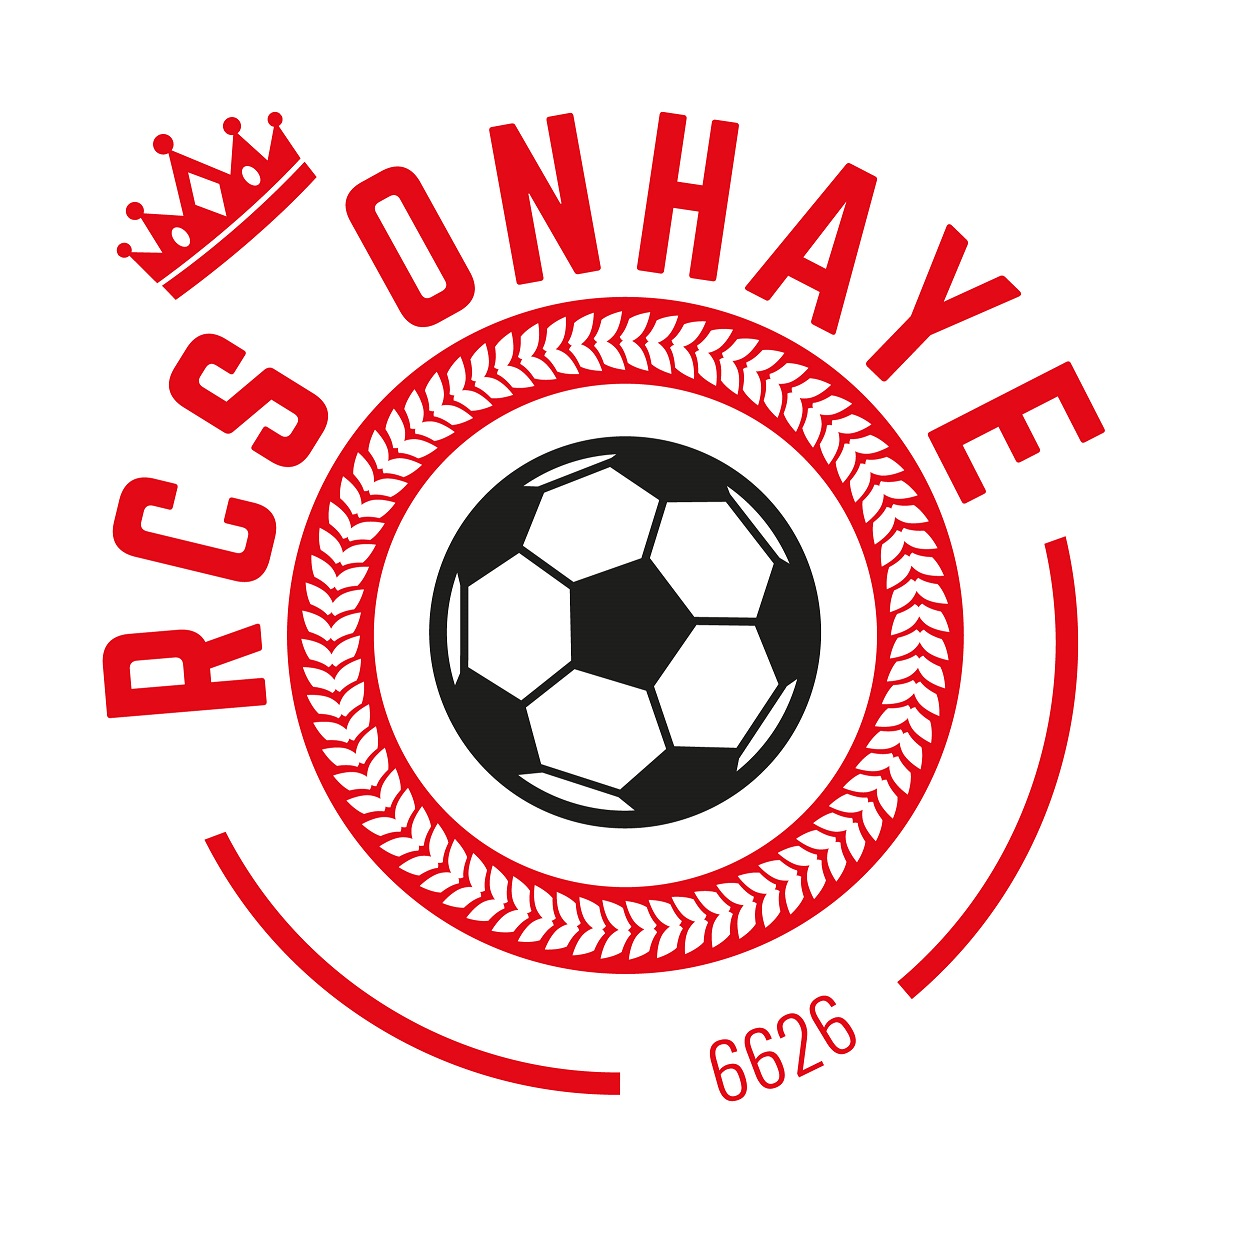 5 - CS Onhaye B